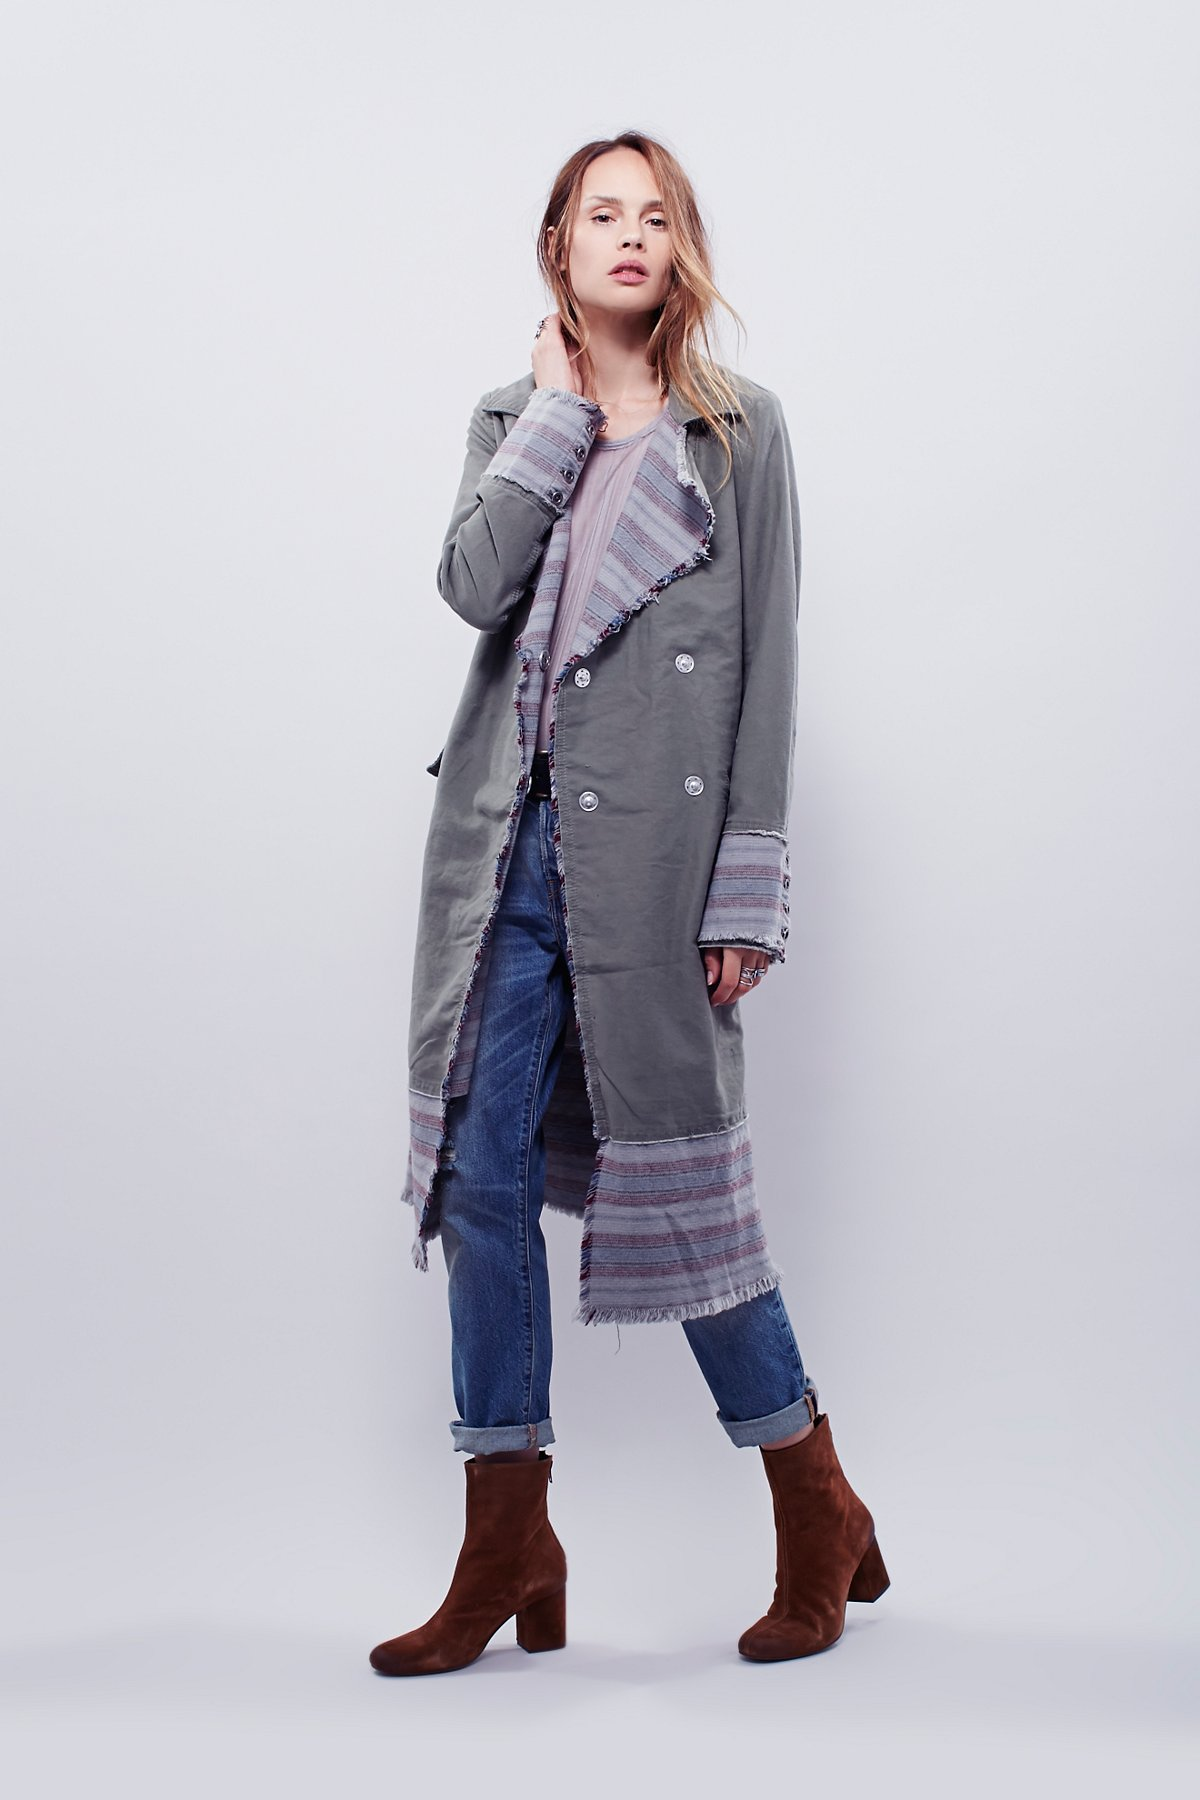 Blanket条纹防尘衣